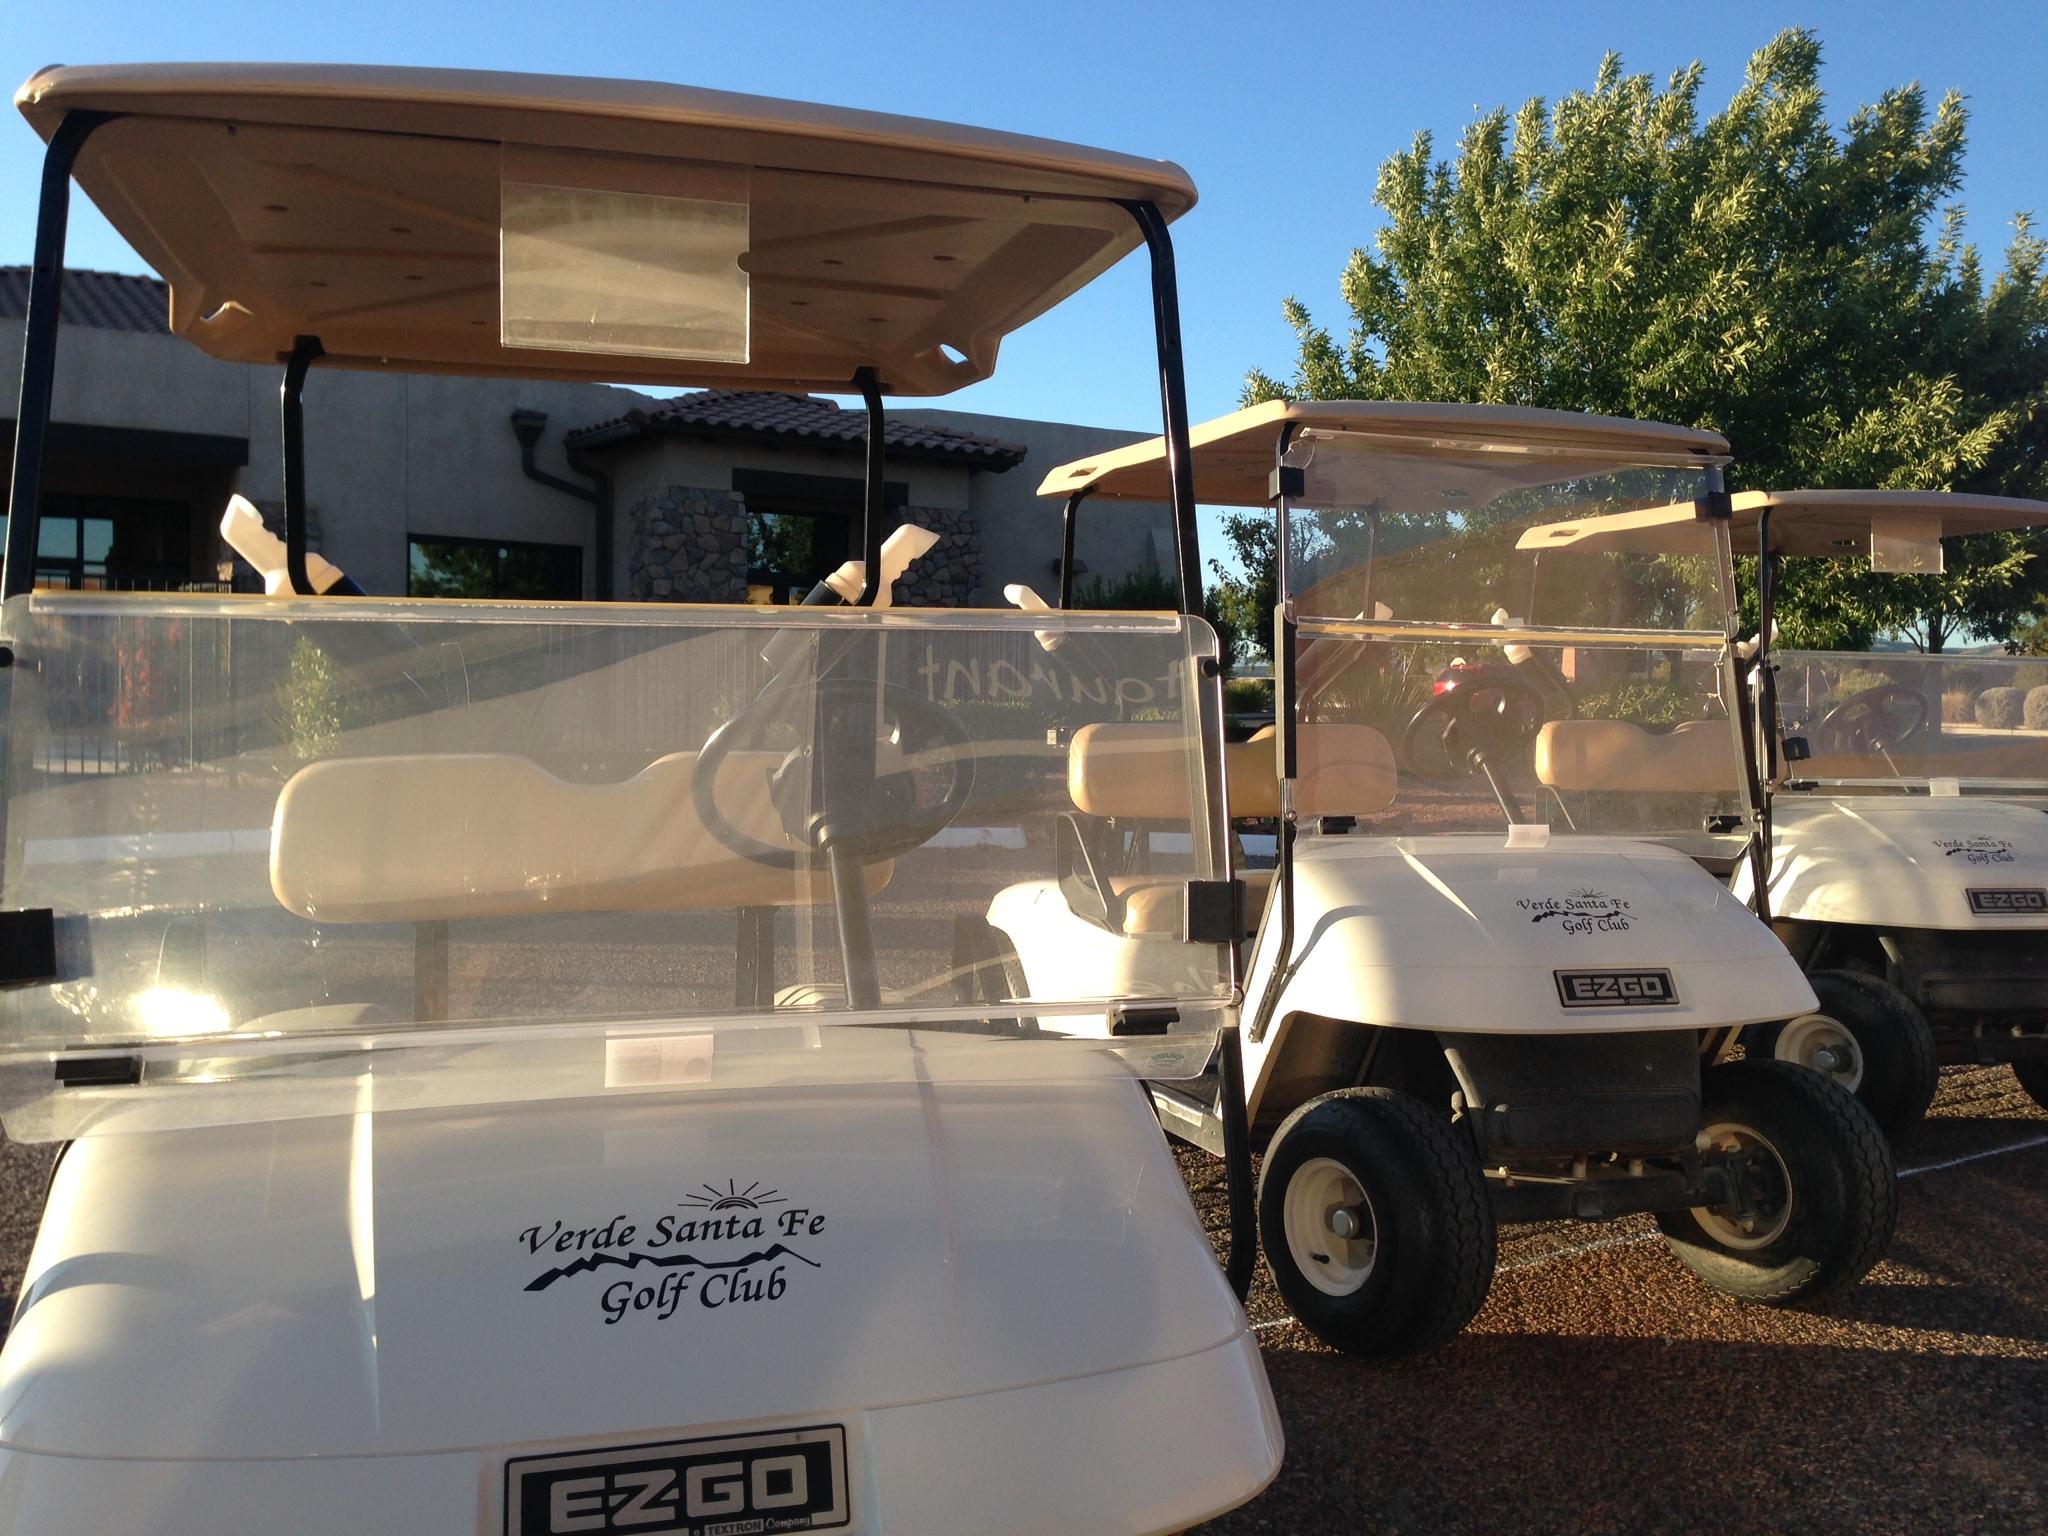 Verde-Santa-Fe-Golf-Carts.jpg